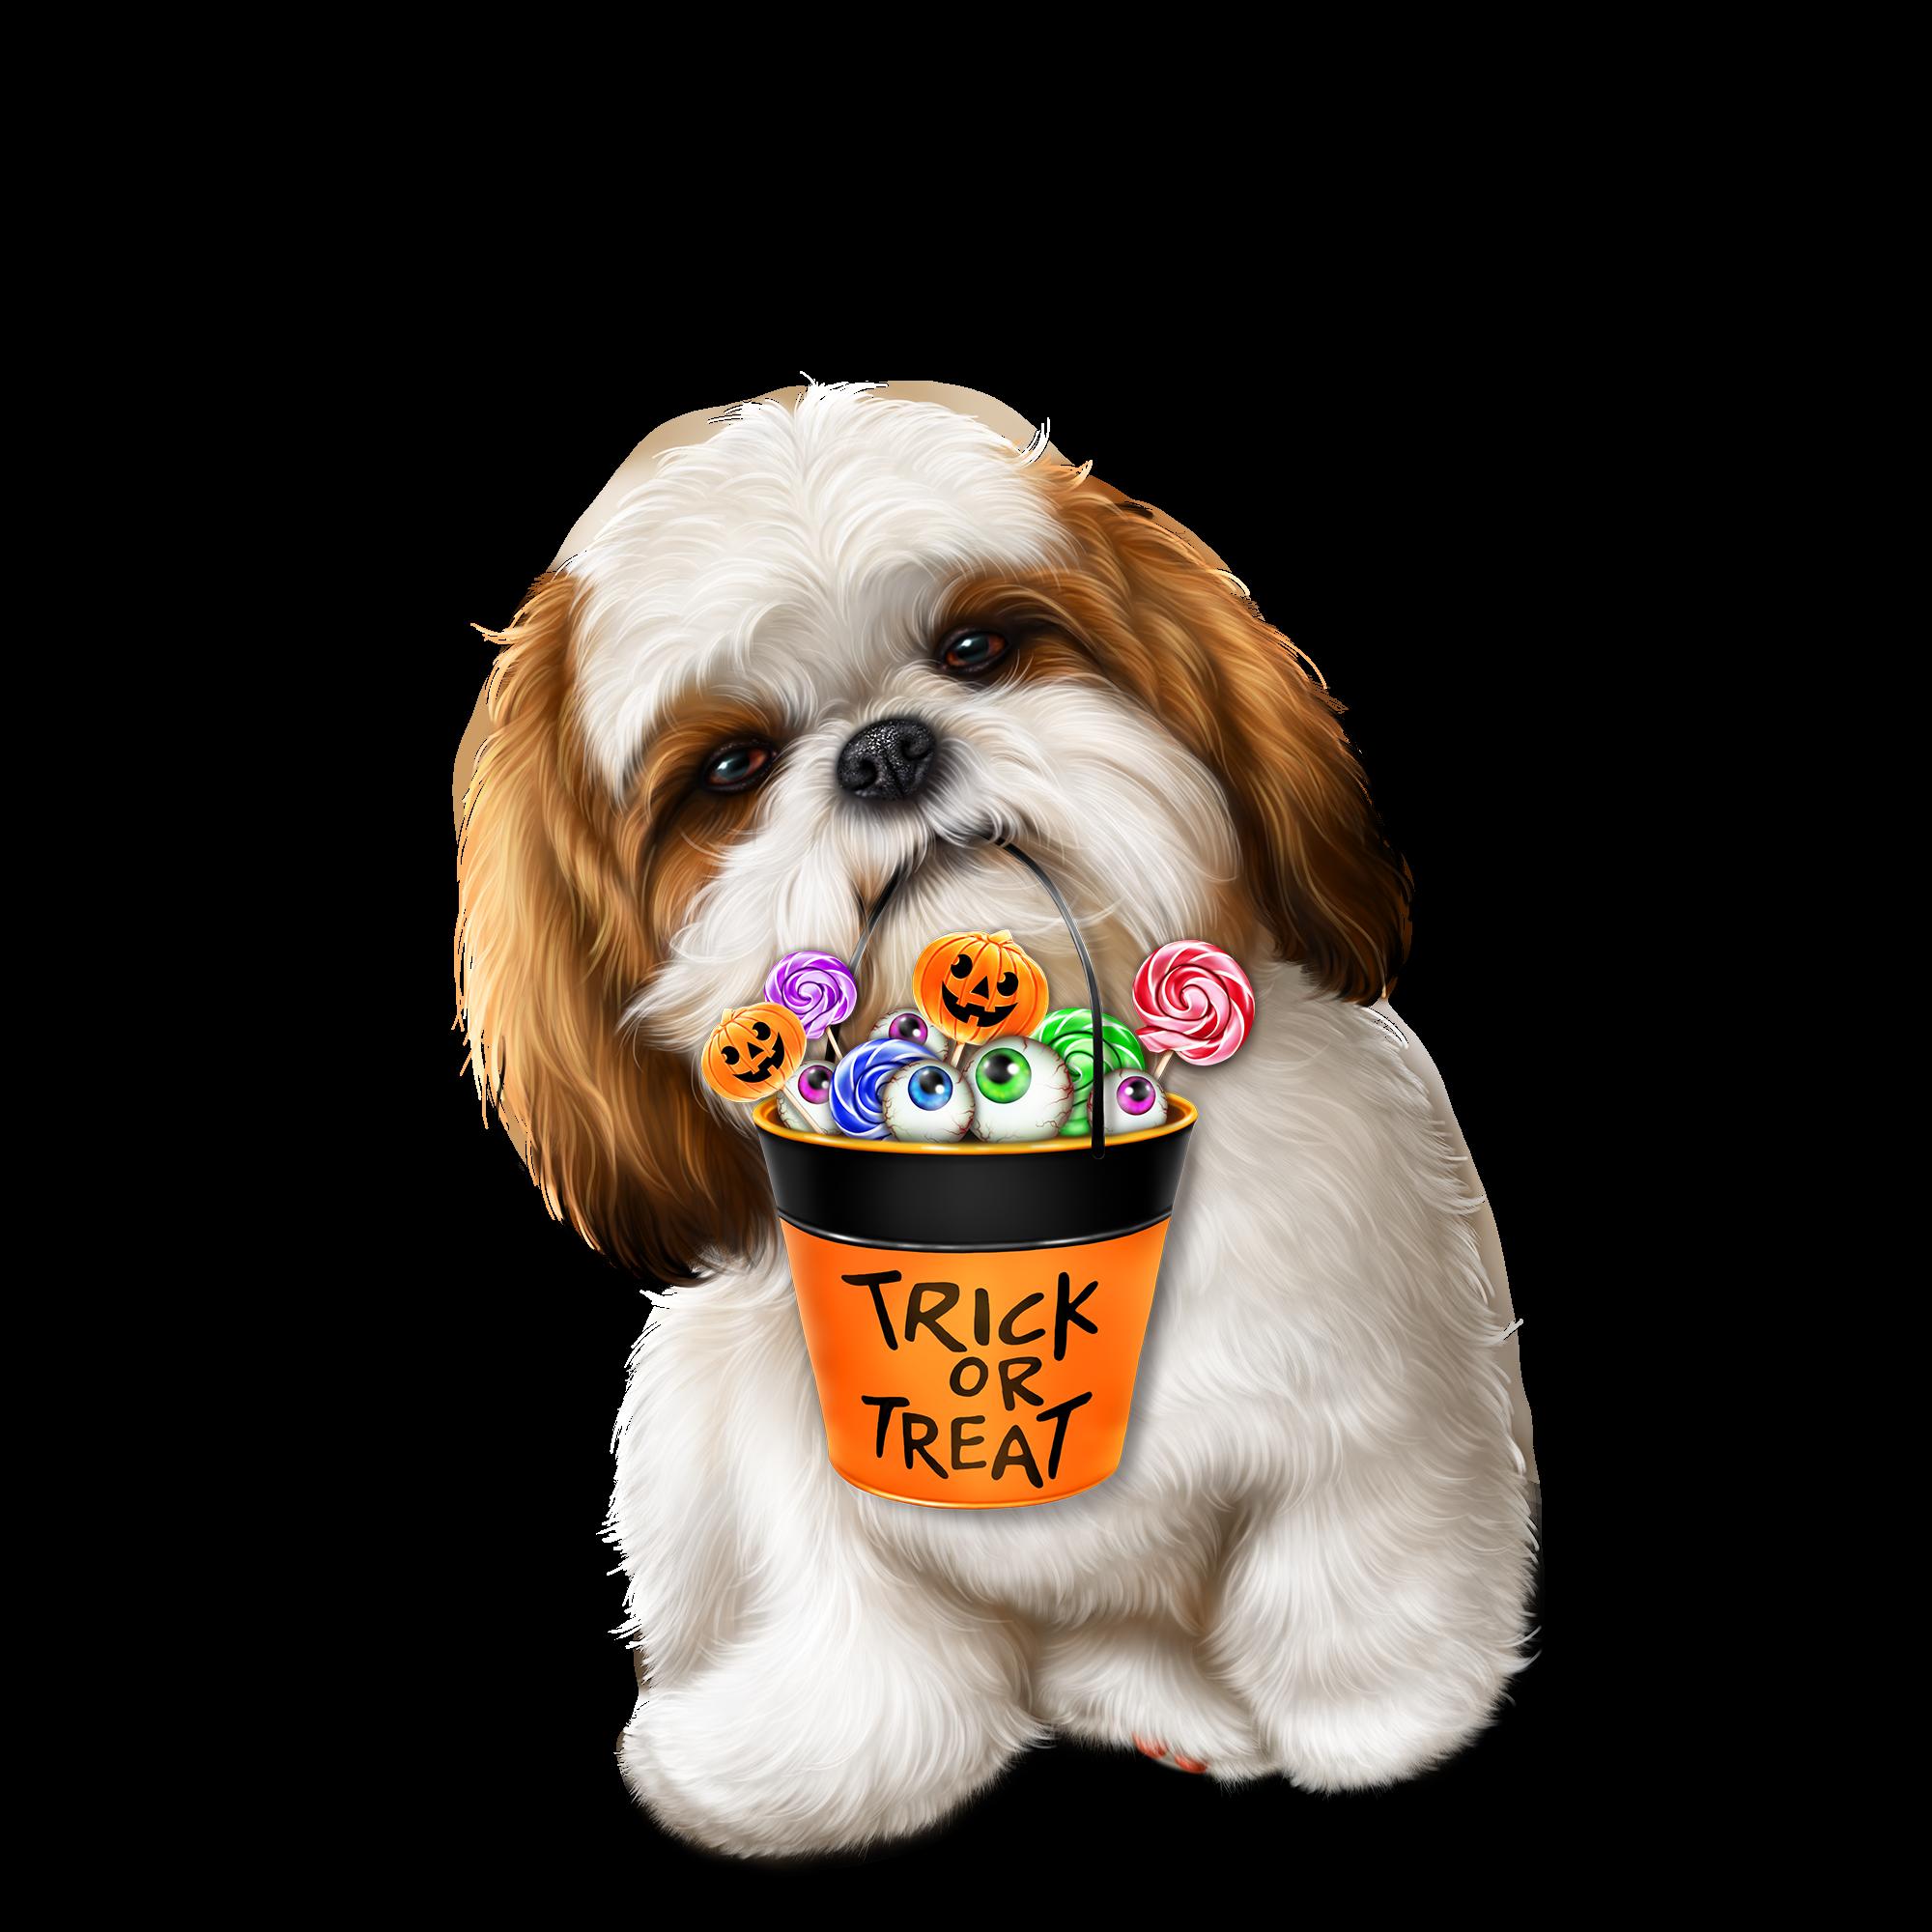 Pin By Melissa Cichon On Dog Puppy Art Teddy Bear Dog Pet Treats